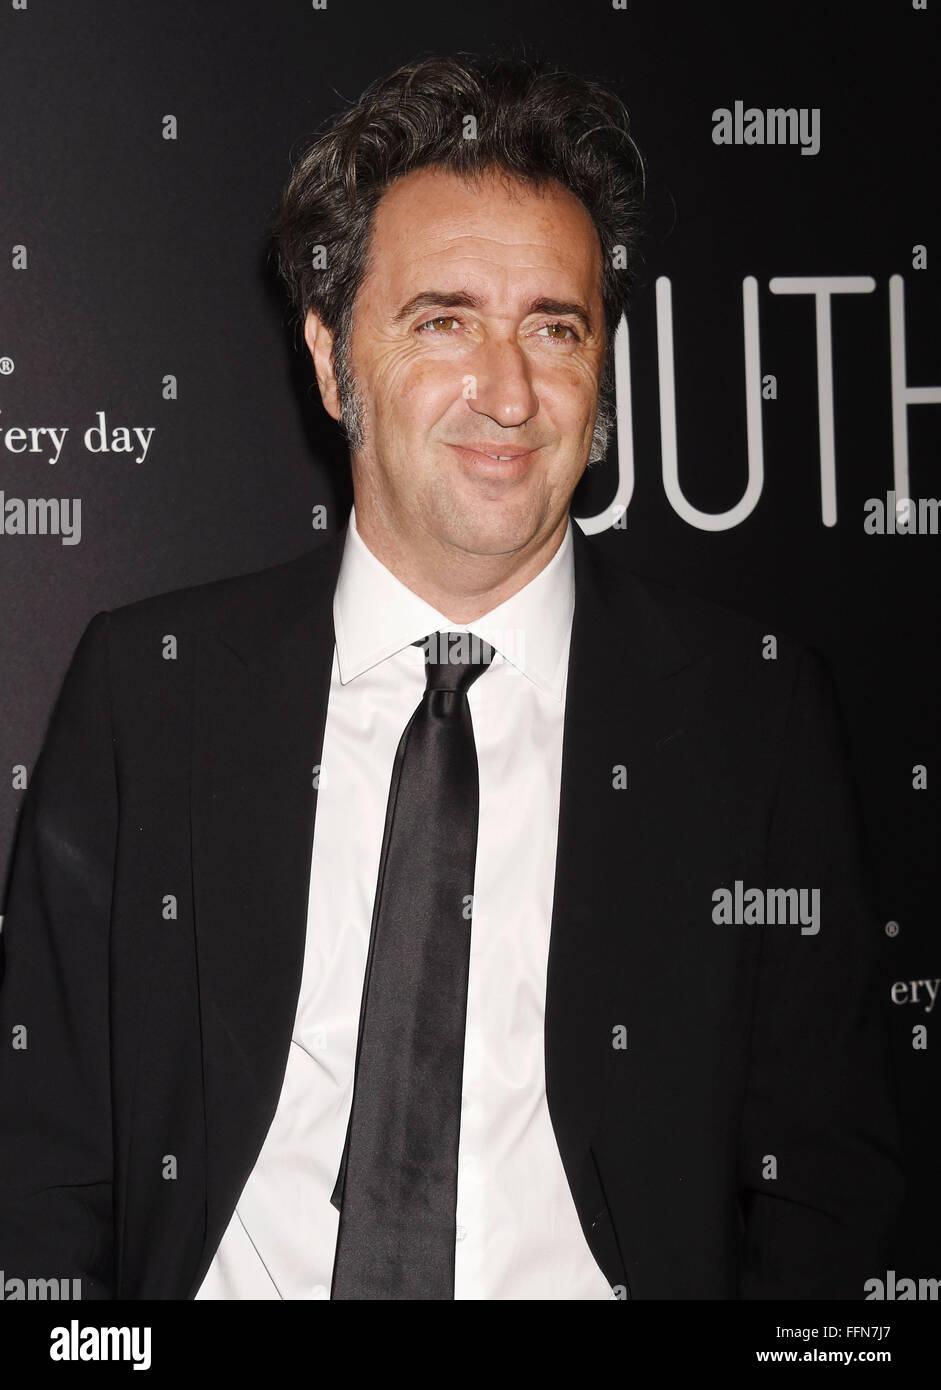 Paolo Sorrentino gilbarco